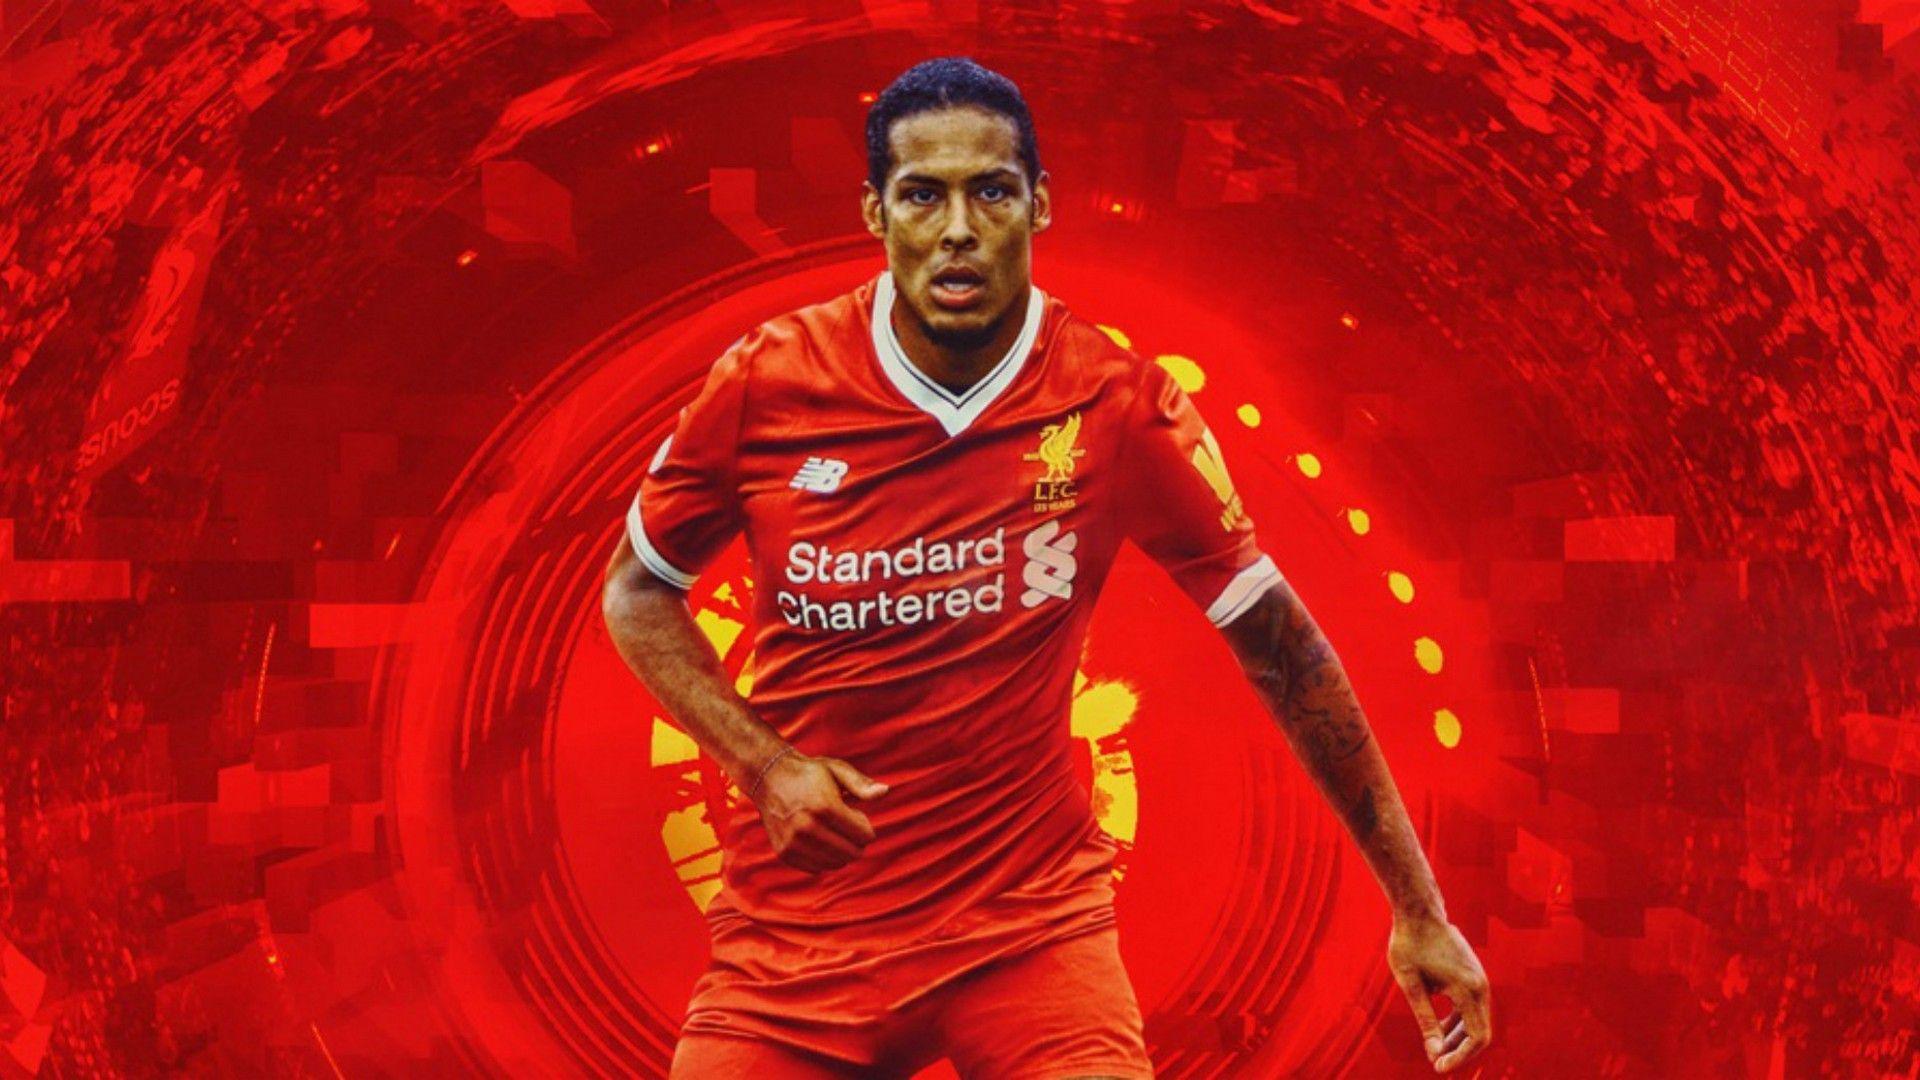 Virgil van Dijk HD Desktop Wallpapers at Liverpool FC ...